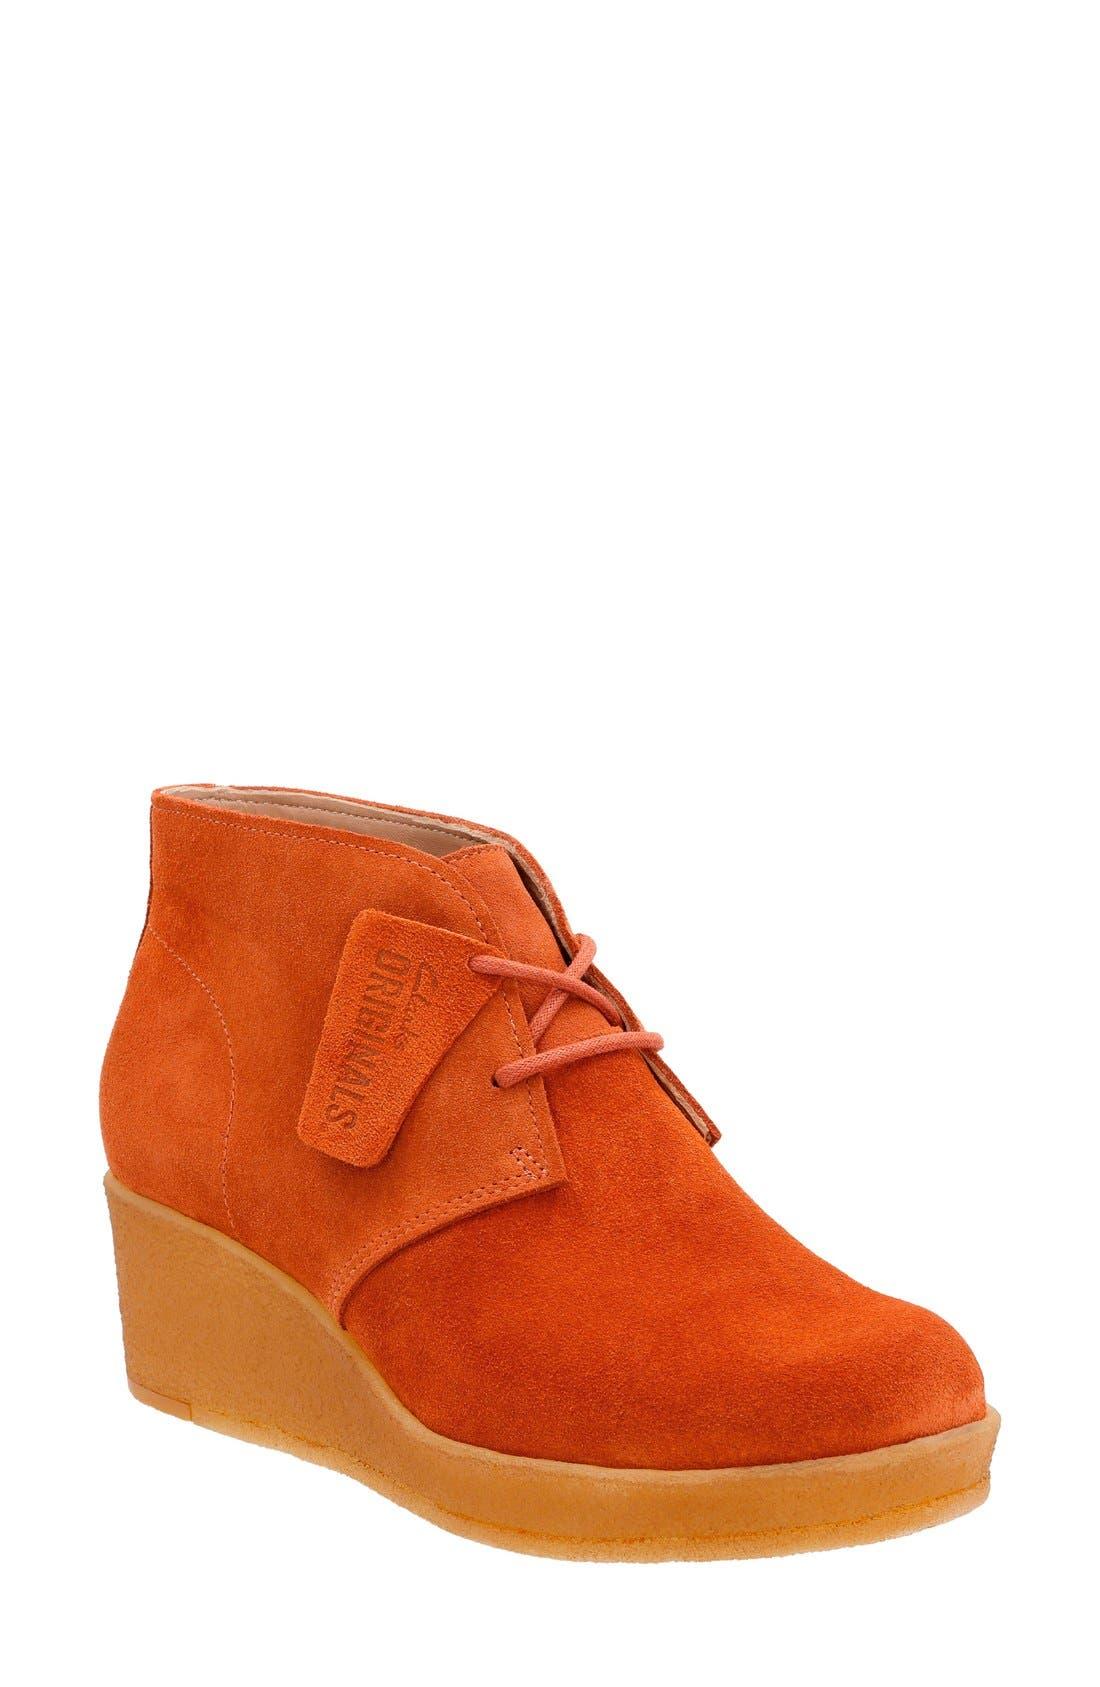 Alternate Image 1 Selected - Clarks® Originals 'Athie Terra' Wedge Boot (Women)